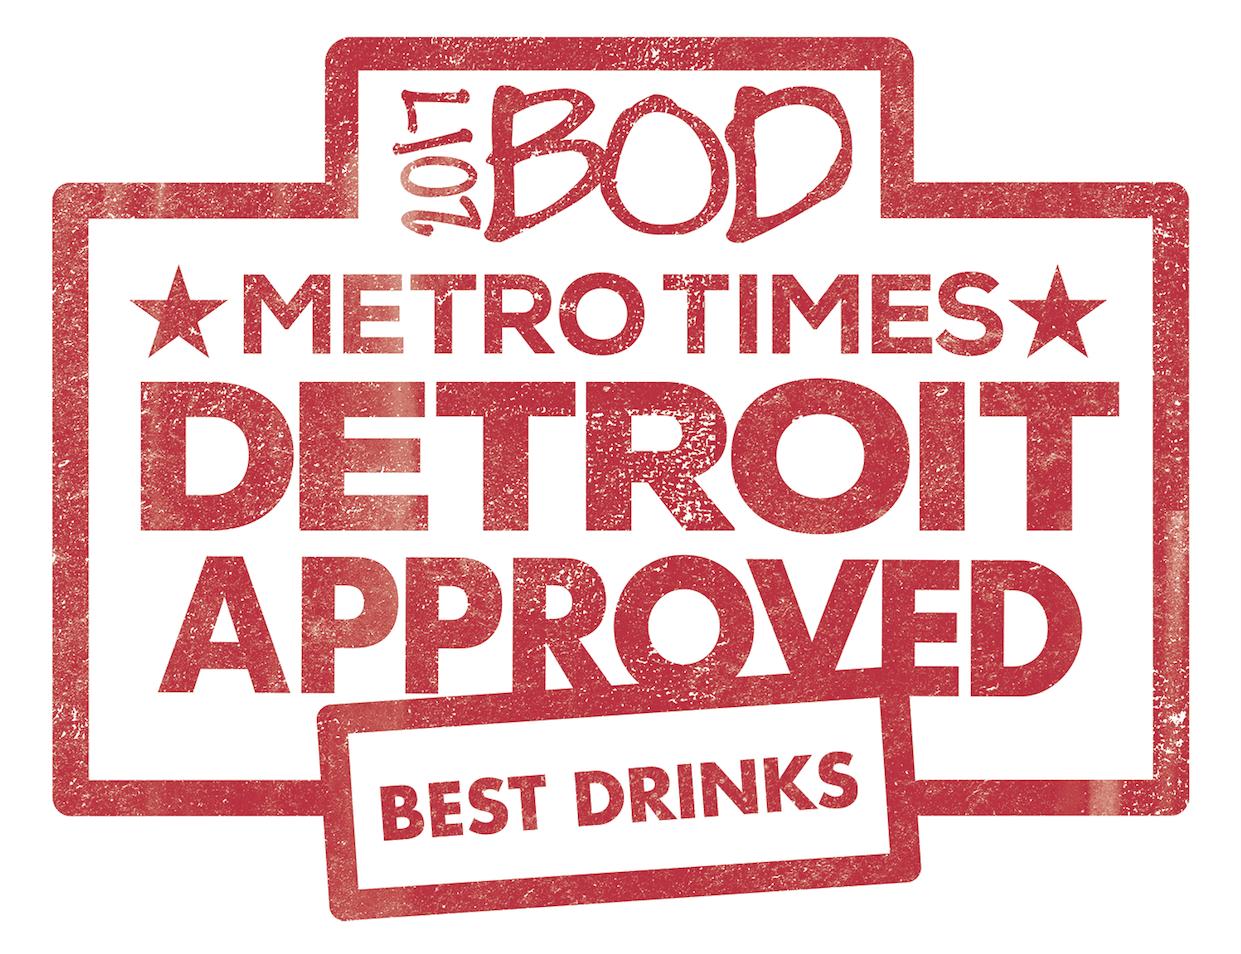 Best of Detroit: Drinks